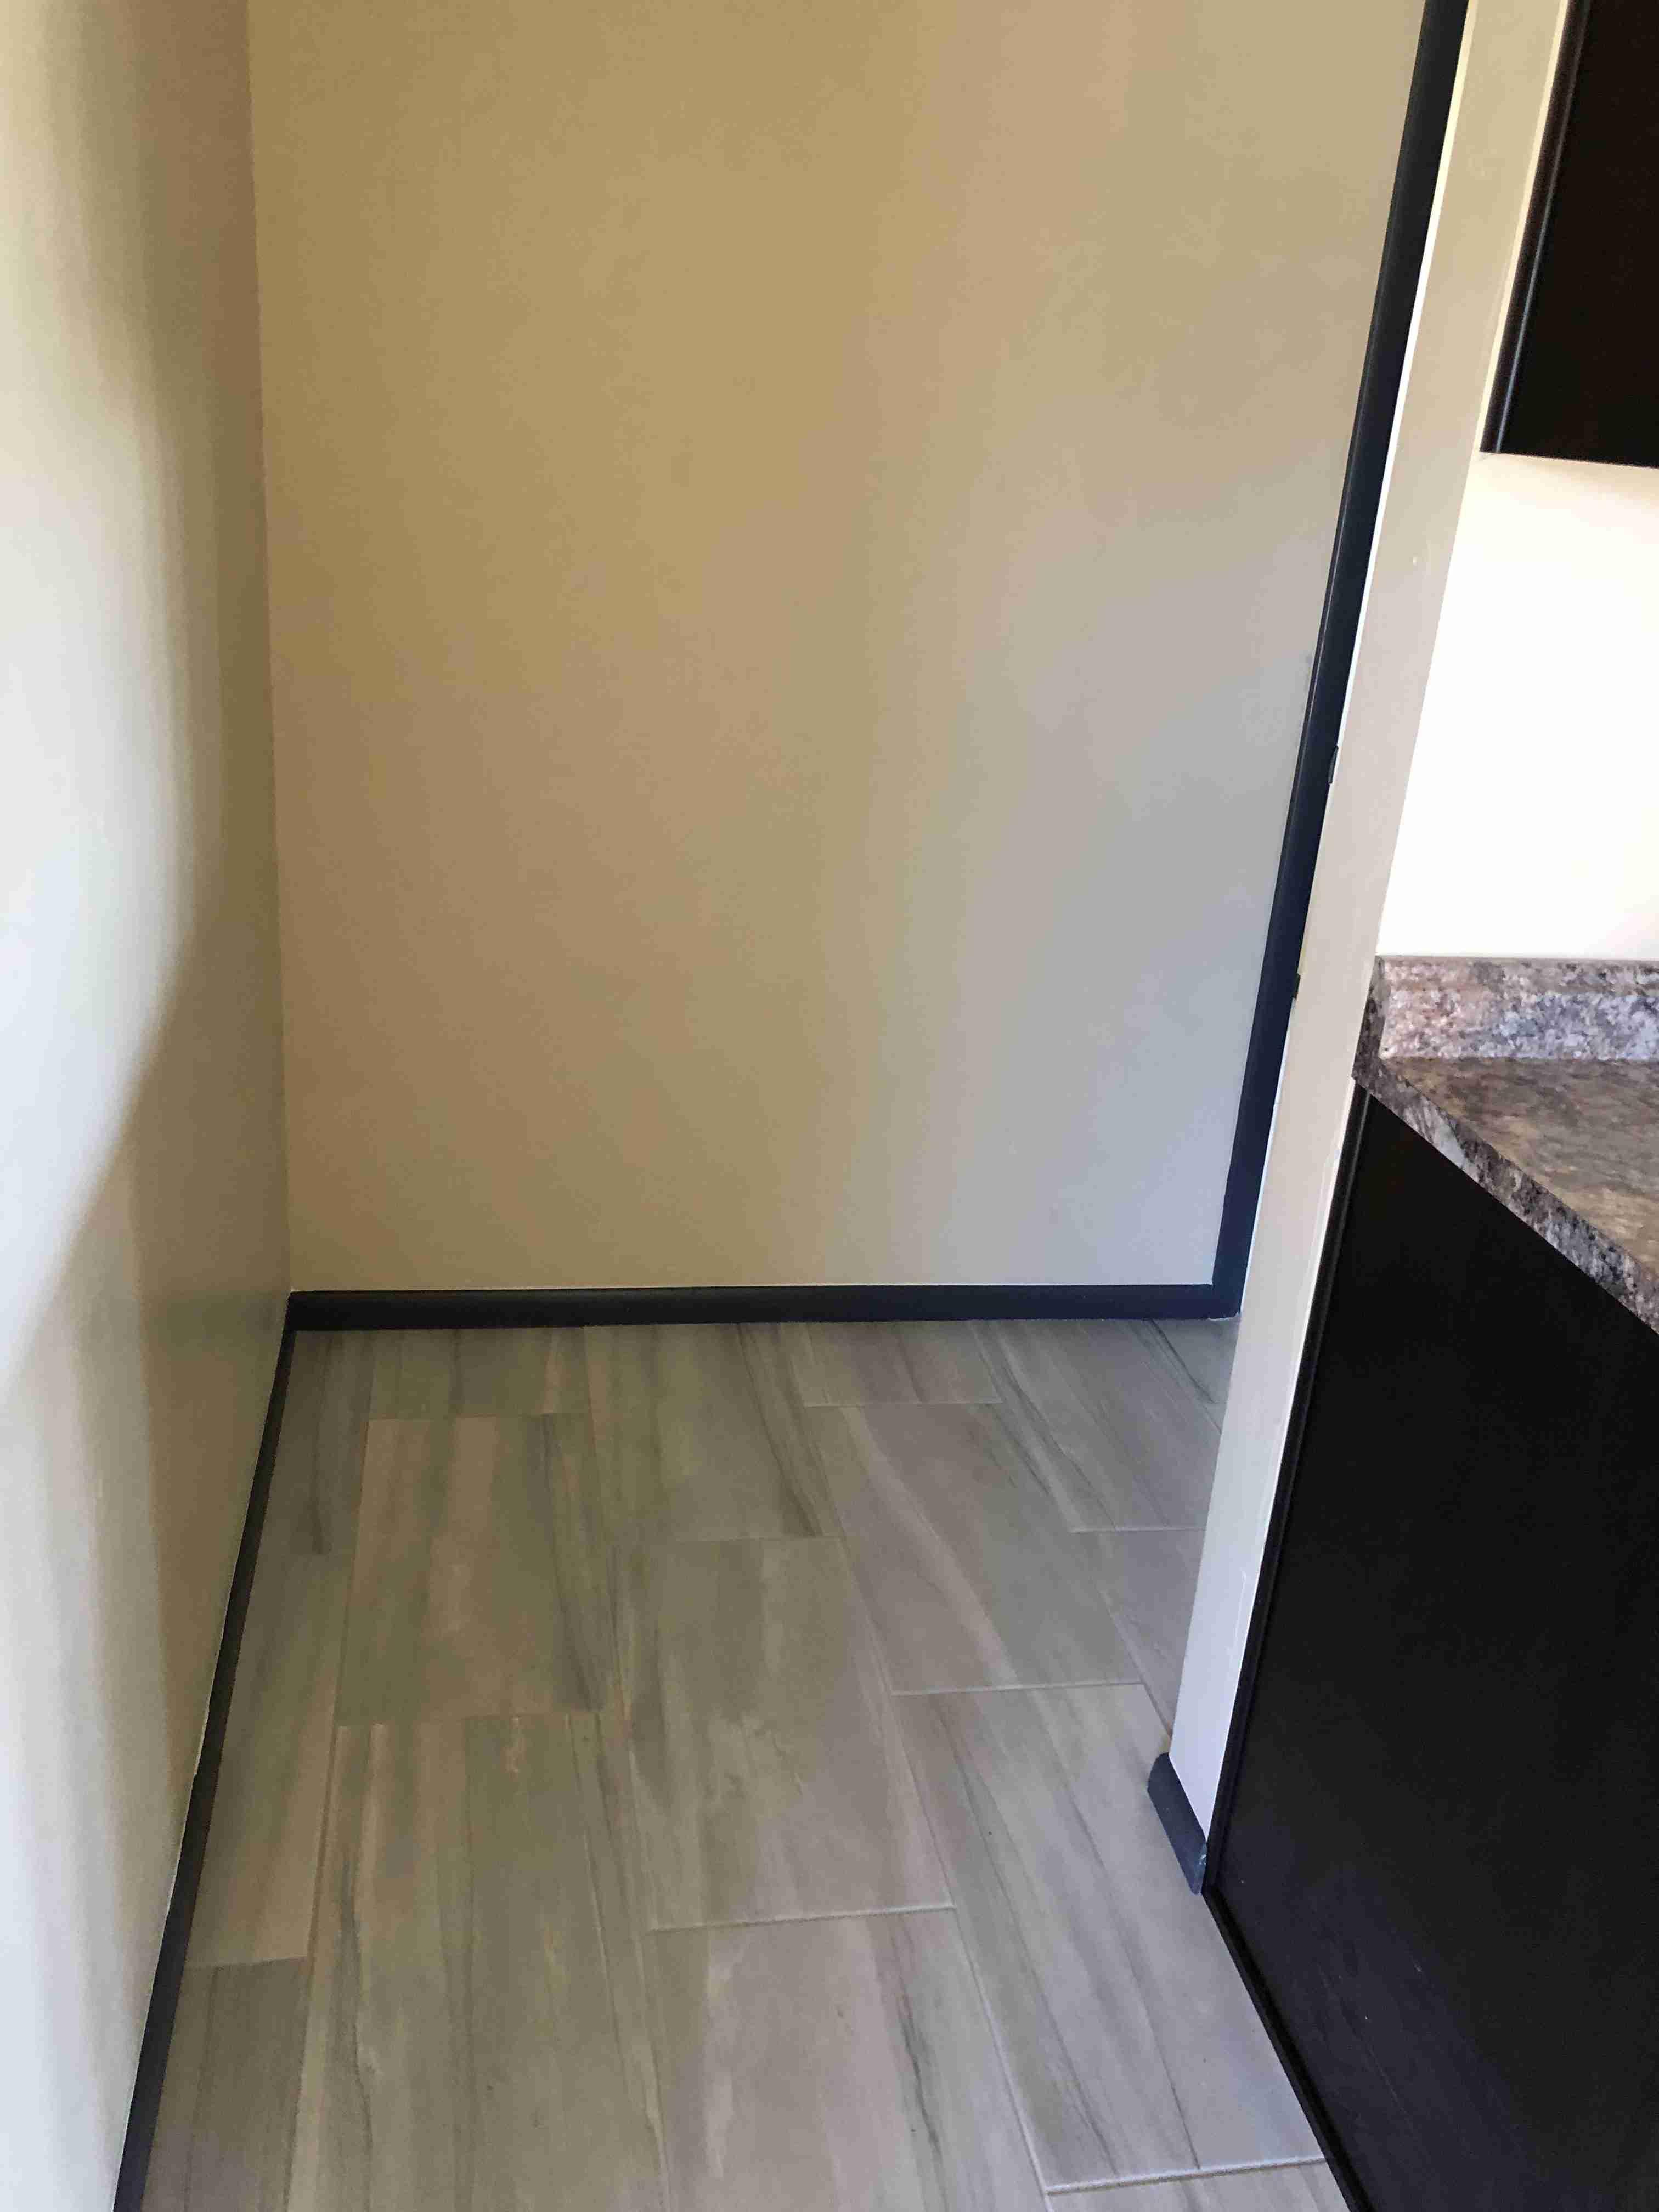 Commercial Tri City Home Improvement Pros